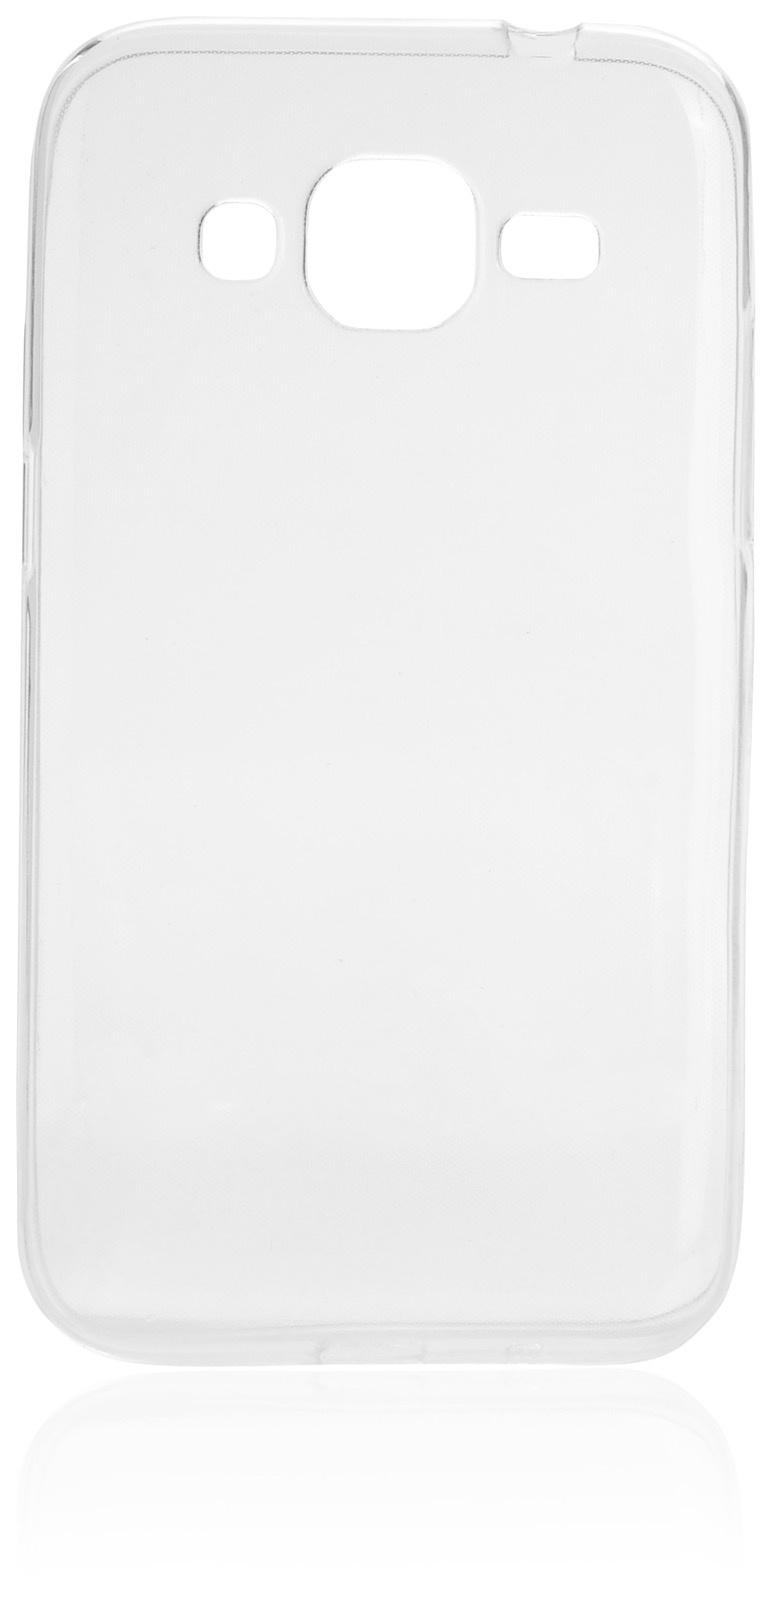 Чехол накладка iNeez силикон для Samsung Galaxy Core Prime SM-G361H (G-360) VE Duos,760013,прозрачный samsung galaxy core prime ve duos sm g361h white